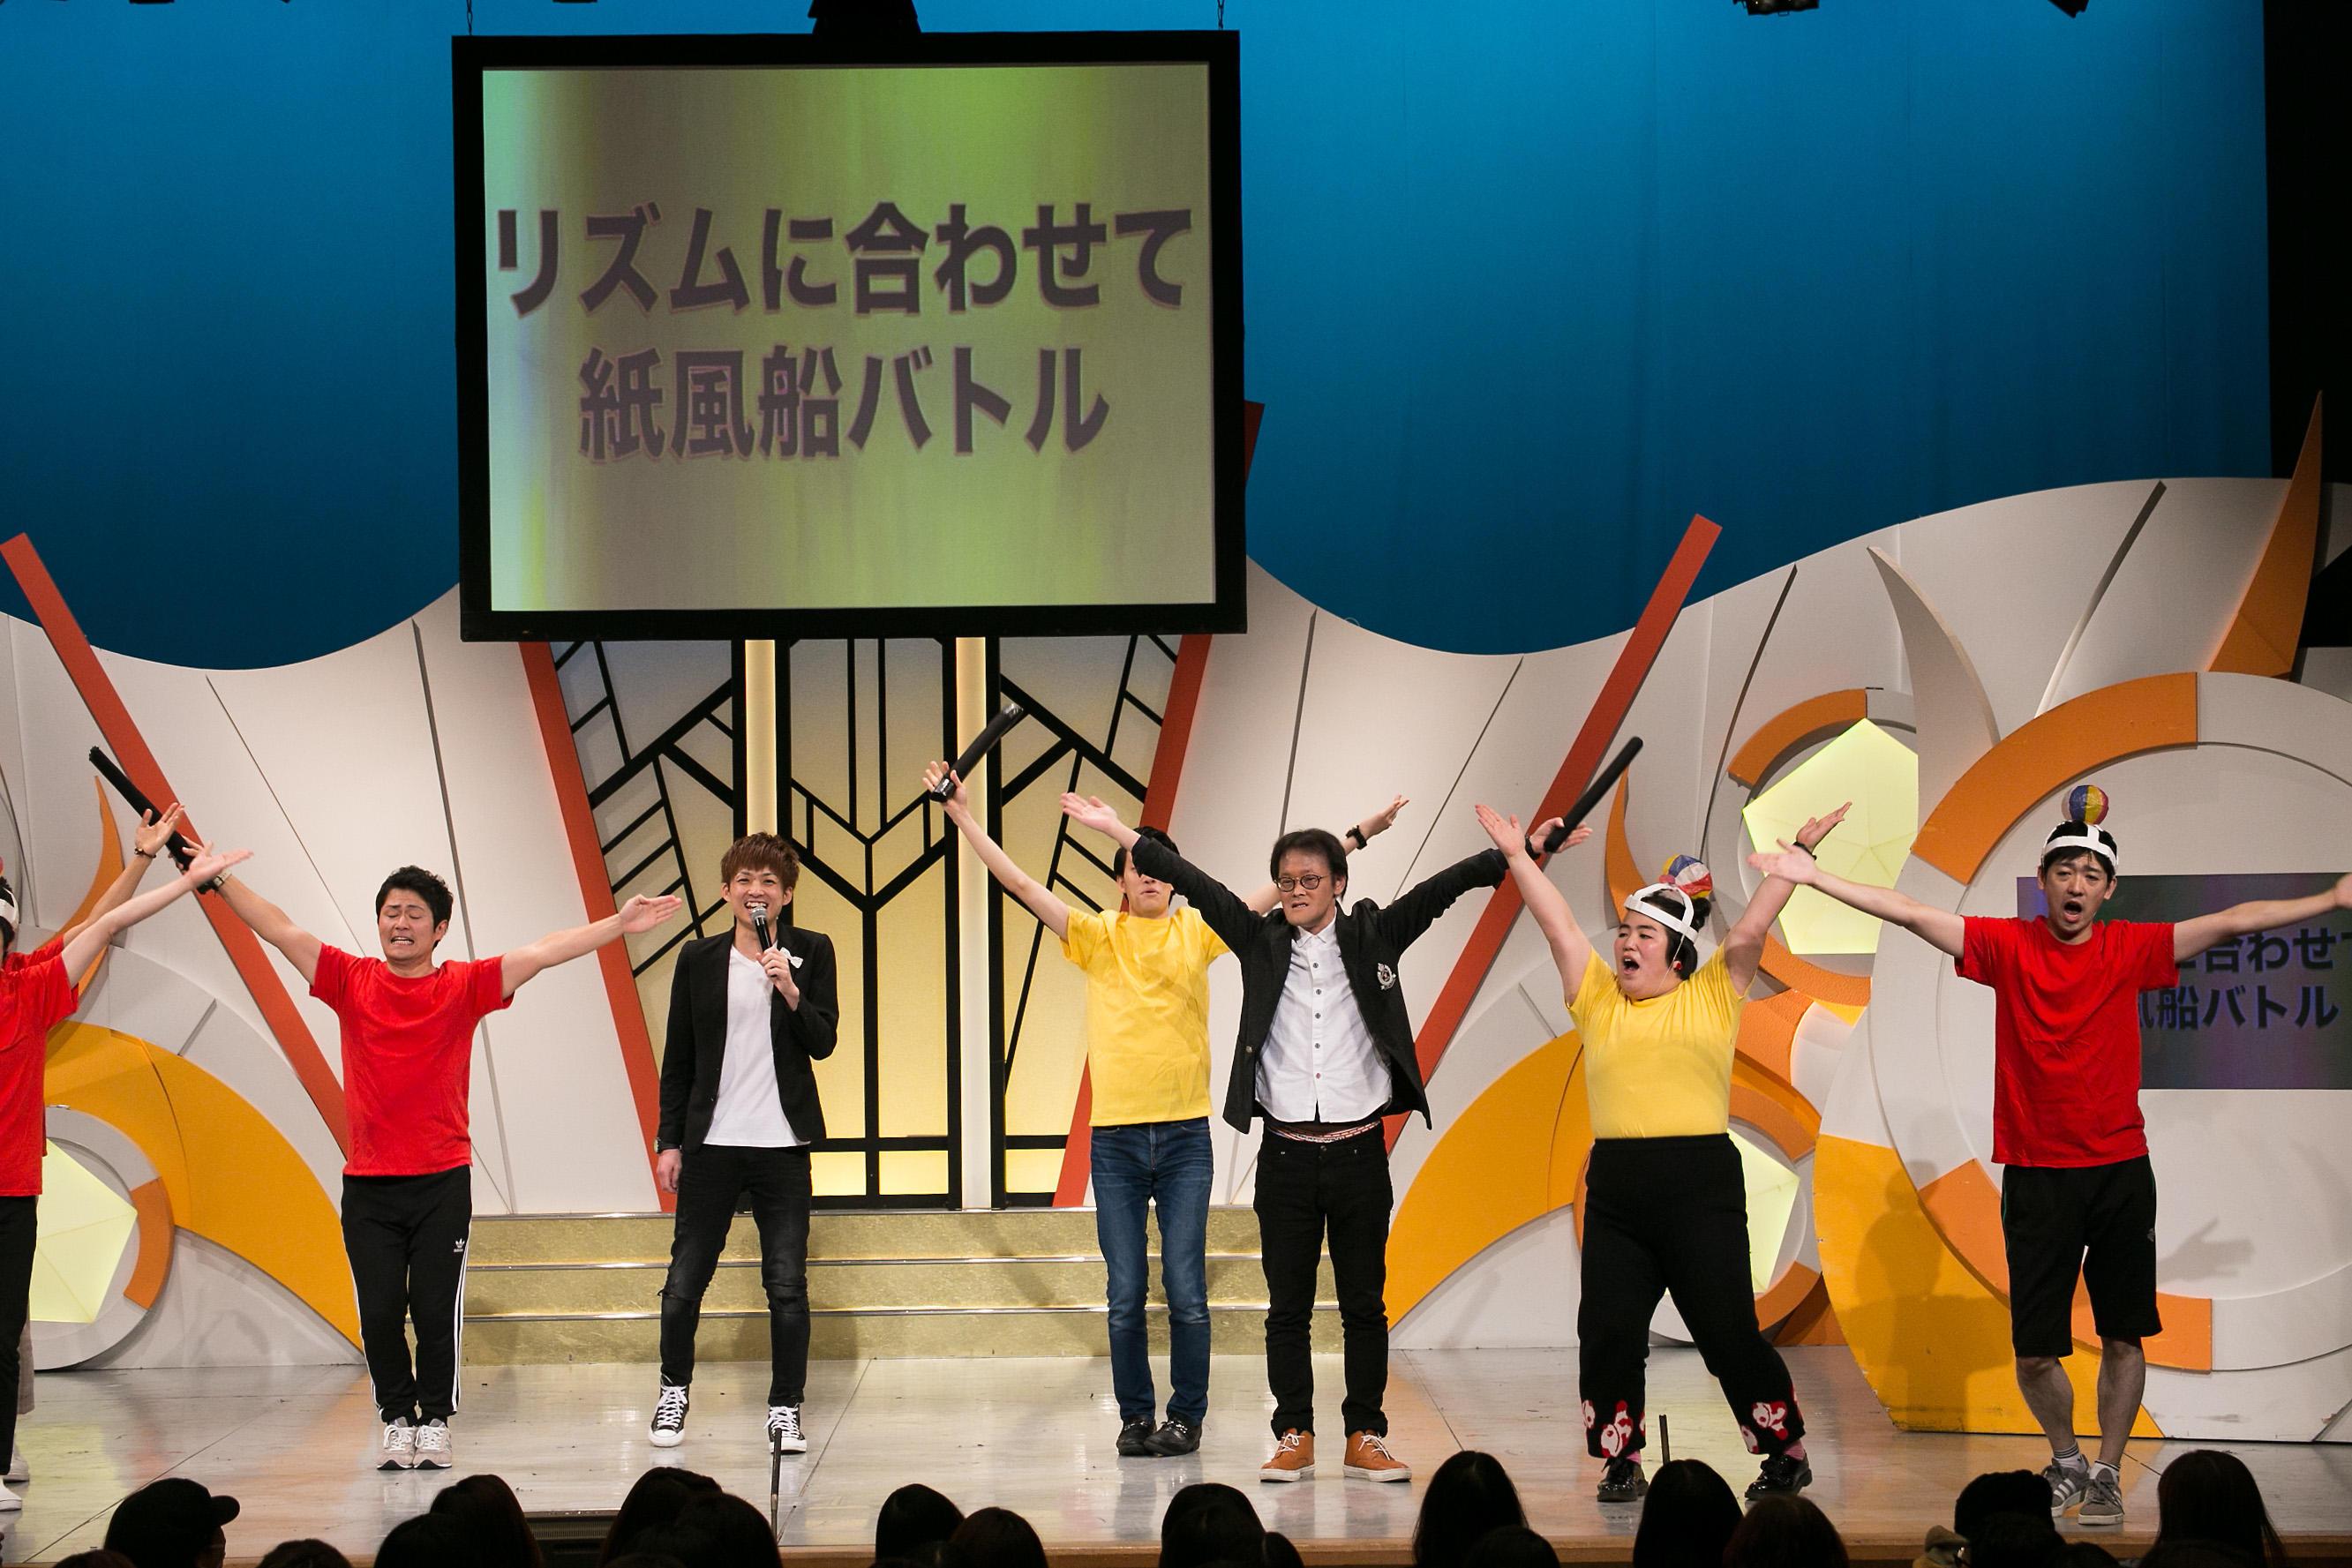 http://news.yoshimoto.co.jp/20171205221952-ba1f9a35046d74852892c91453e5e8d9633718d9.jpg